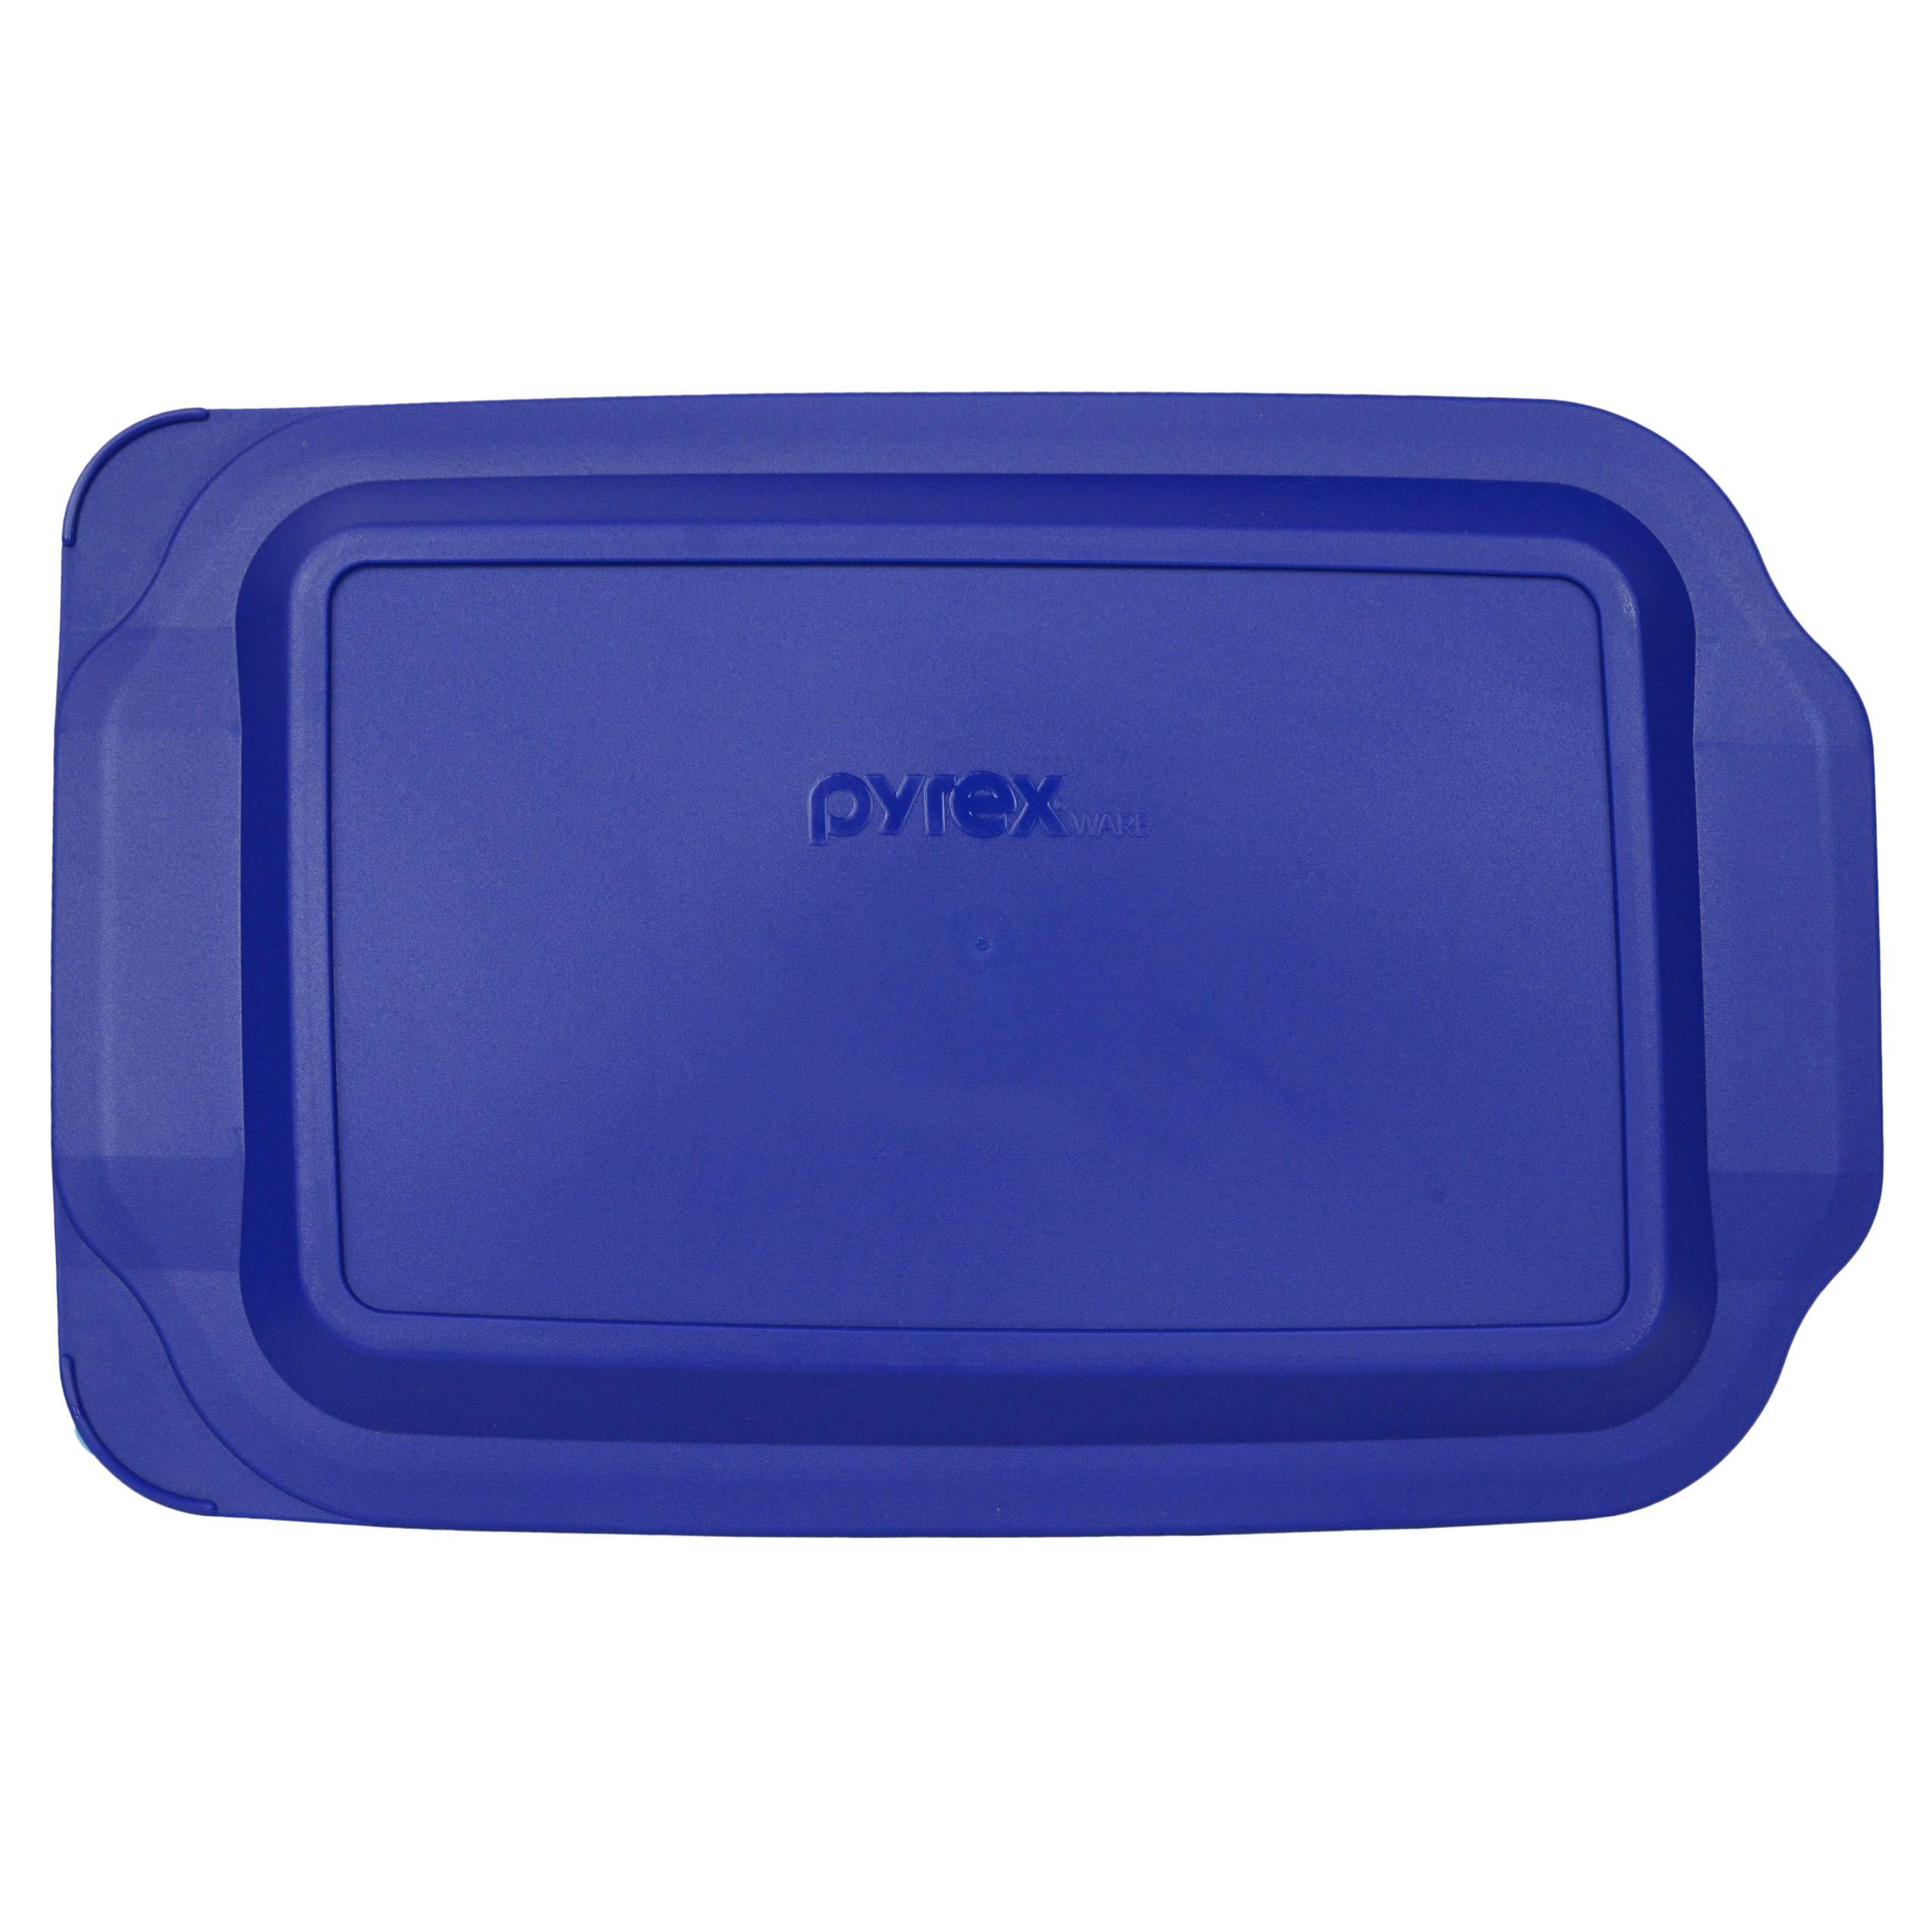 Pyrex 233 Pc 3 Quart Blue 9 Quot X 13 Quot Baking Dish Lid Will